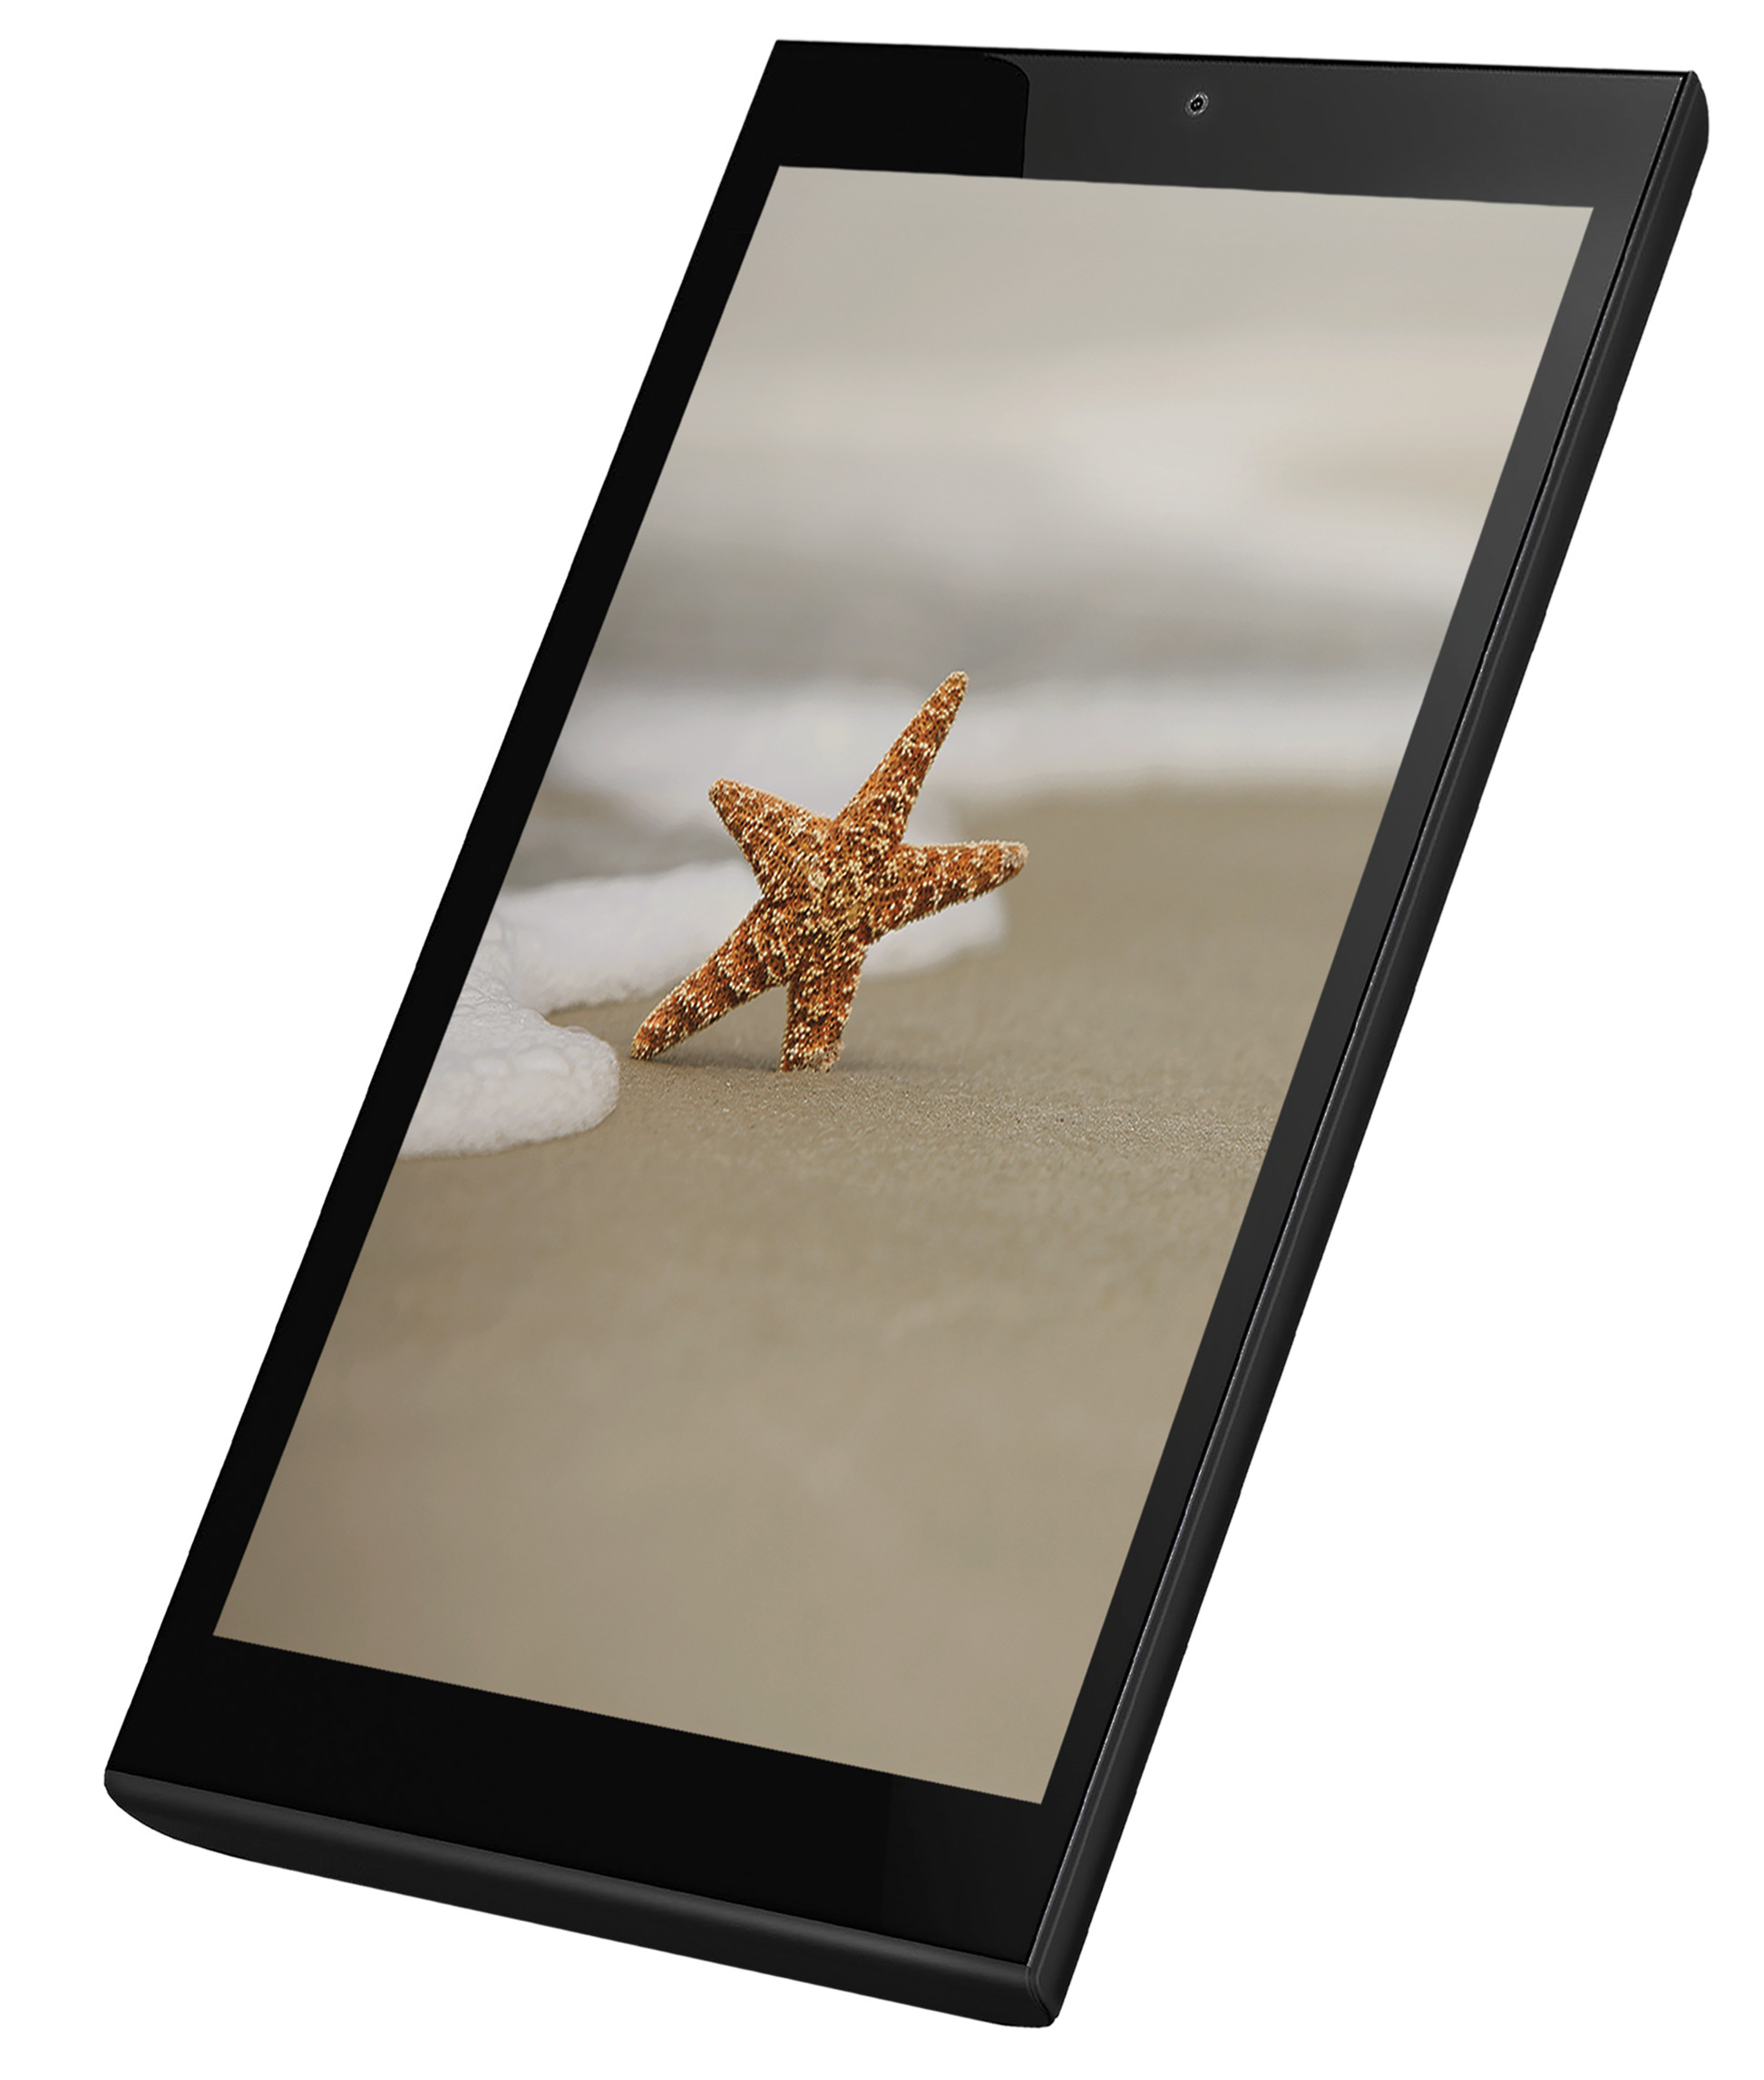 AROA Tablet_3.png